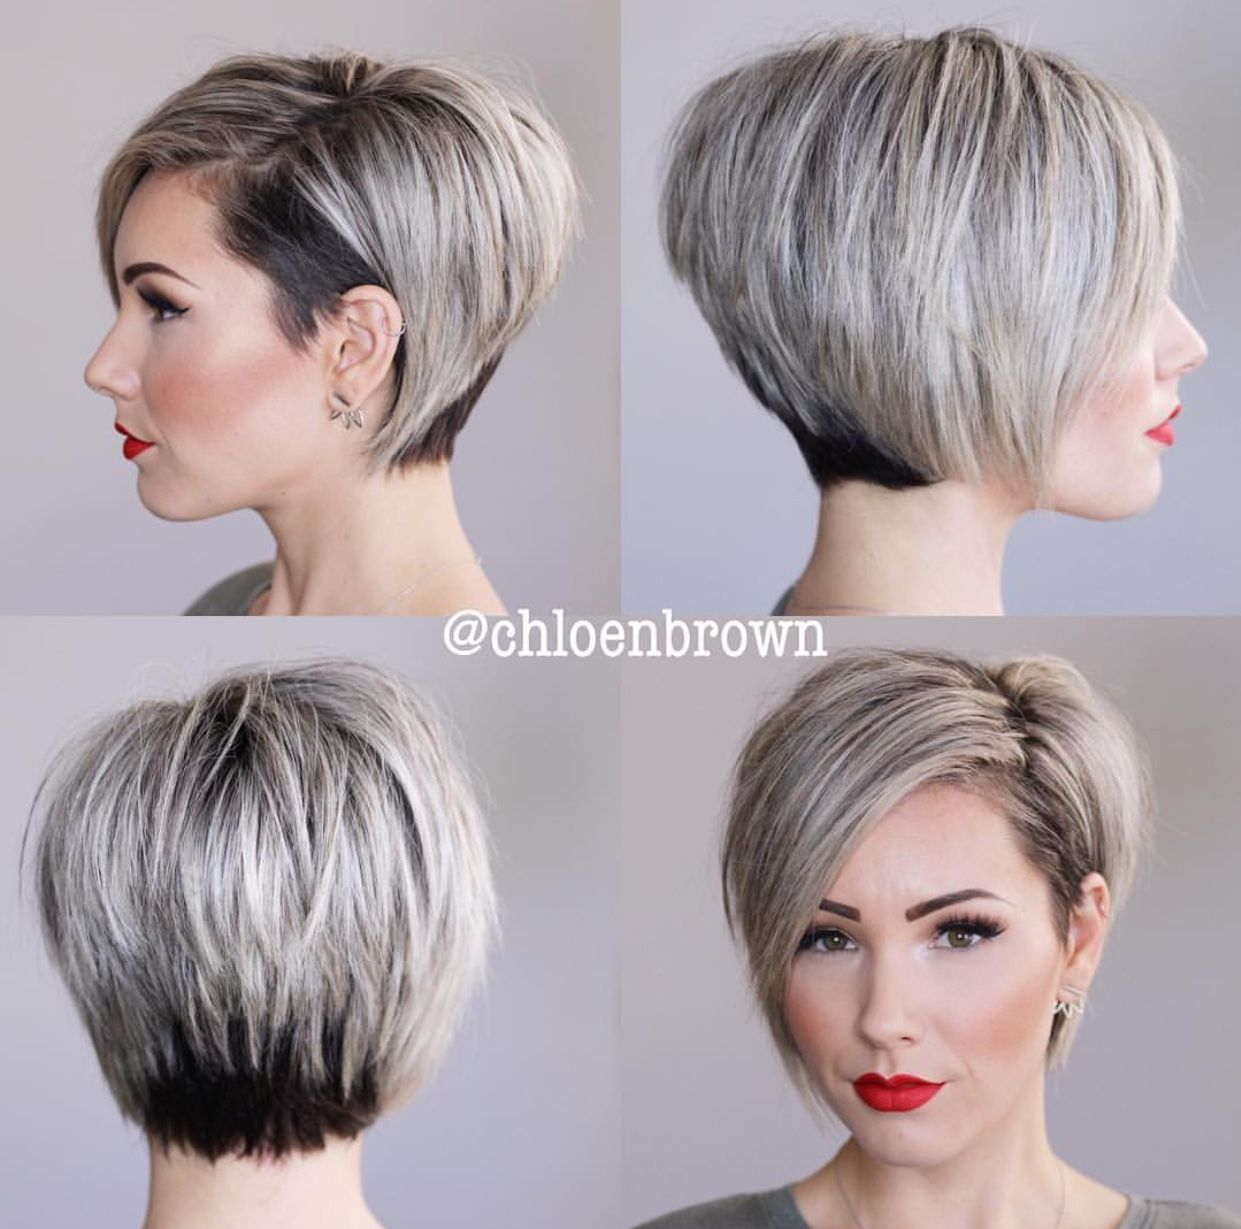 Chloenbrown insta beautiful bob n colour fashion in